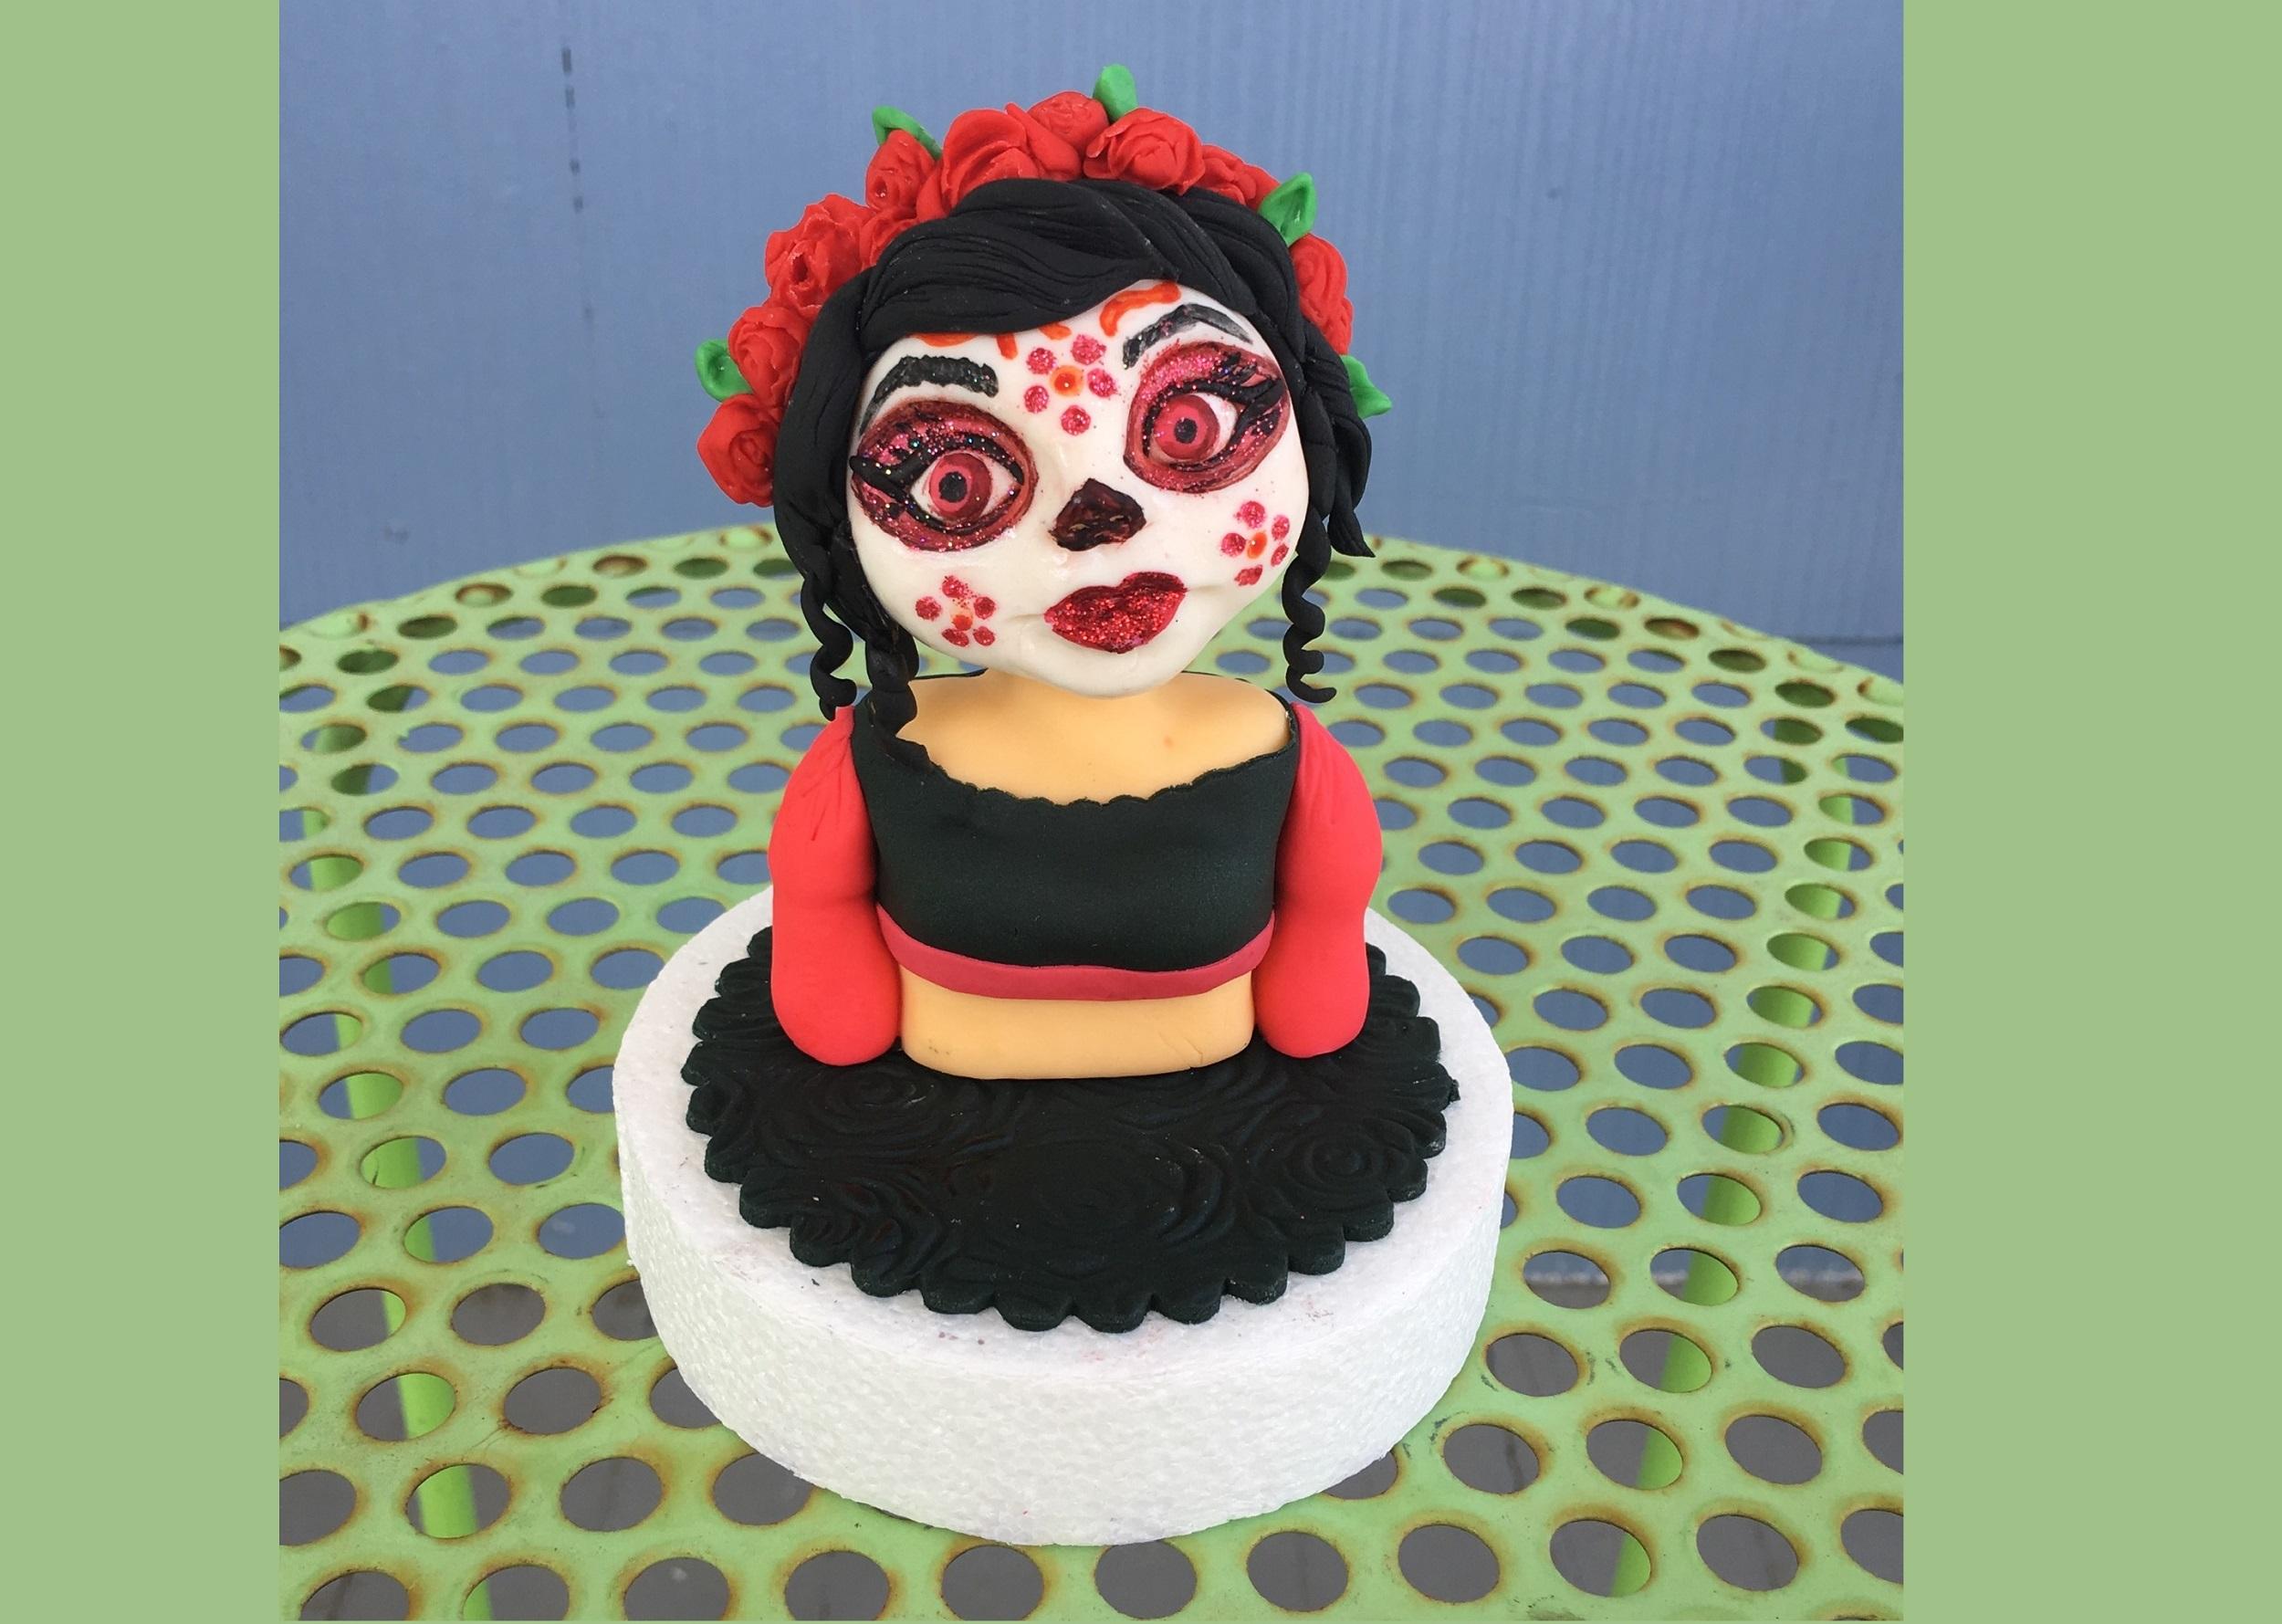 Sculpting Class by Cupcake Tesoro